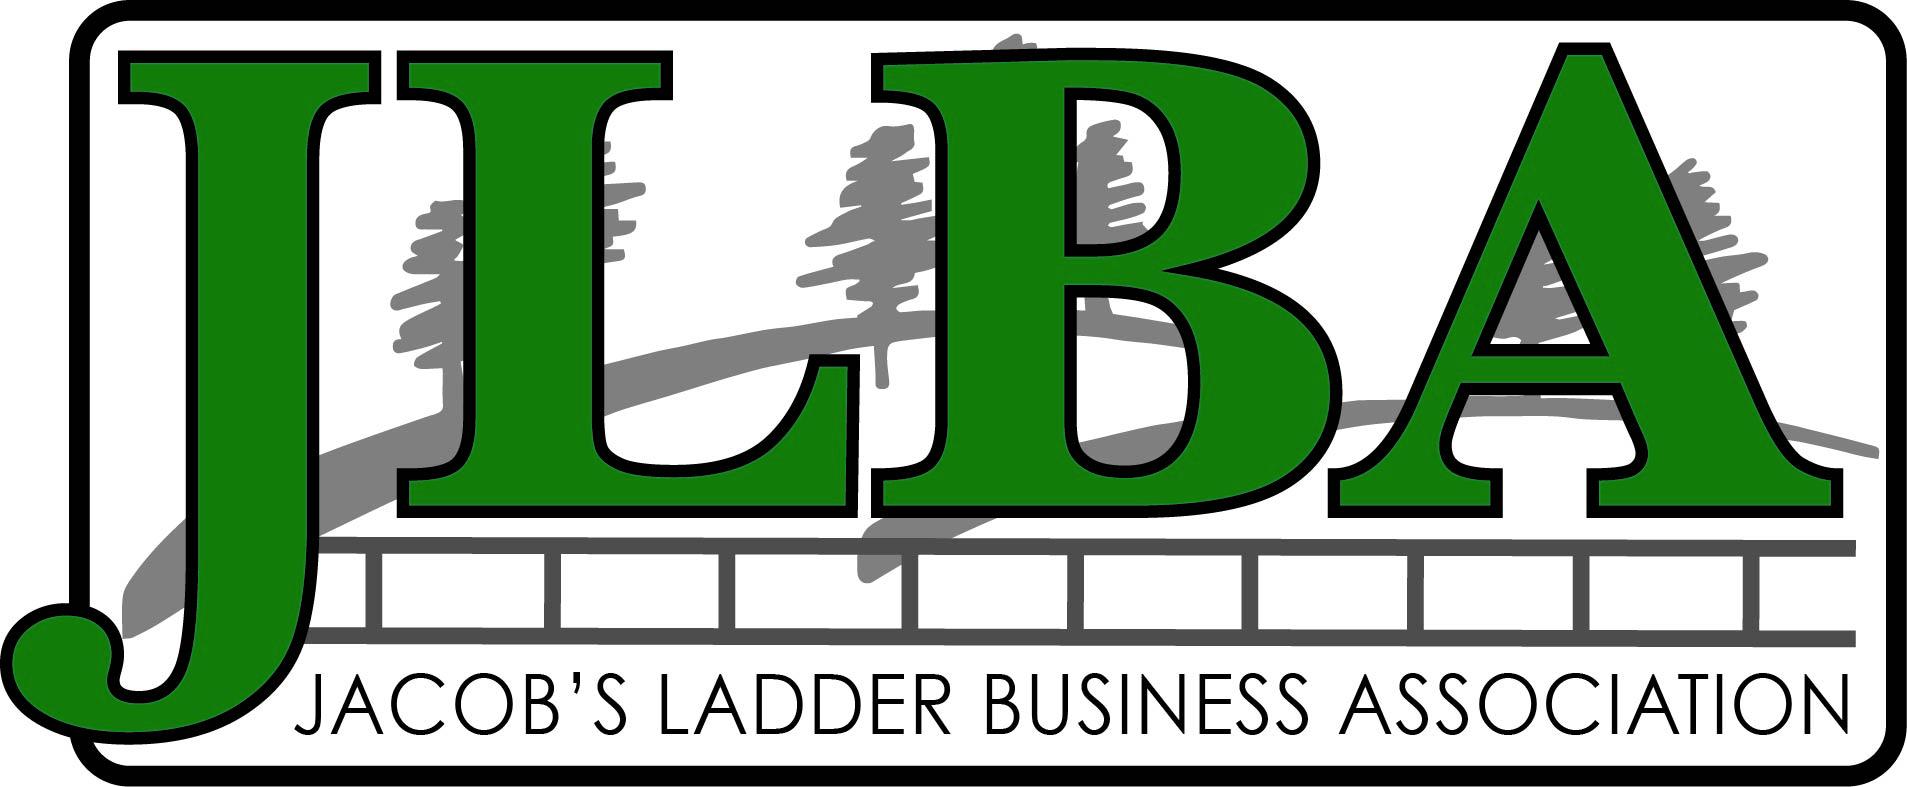 Jacob's Ladder Business Association